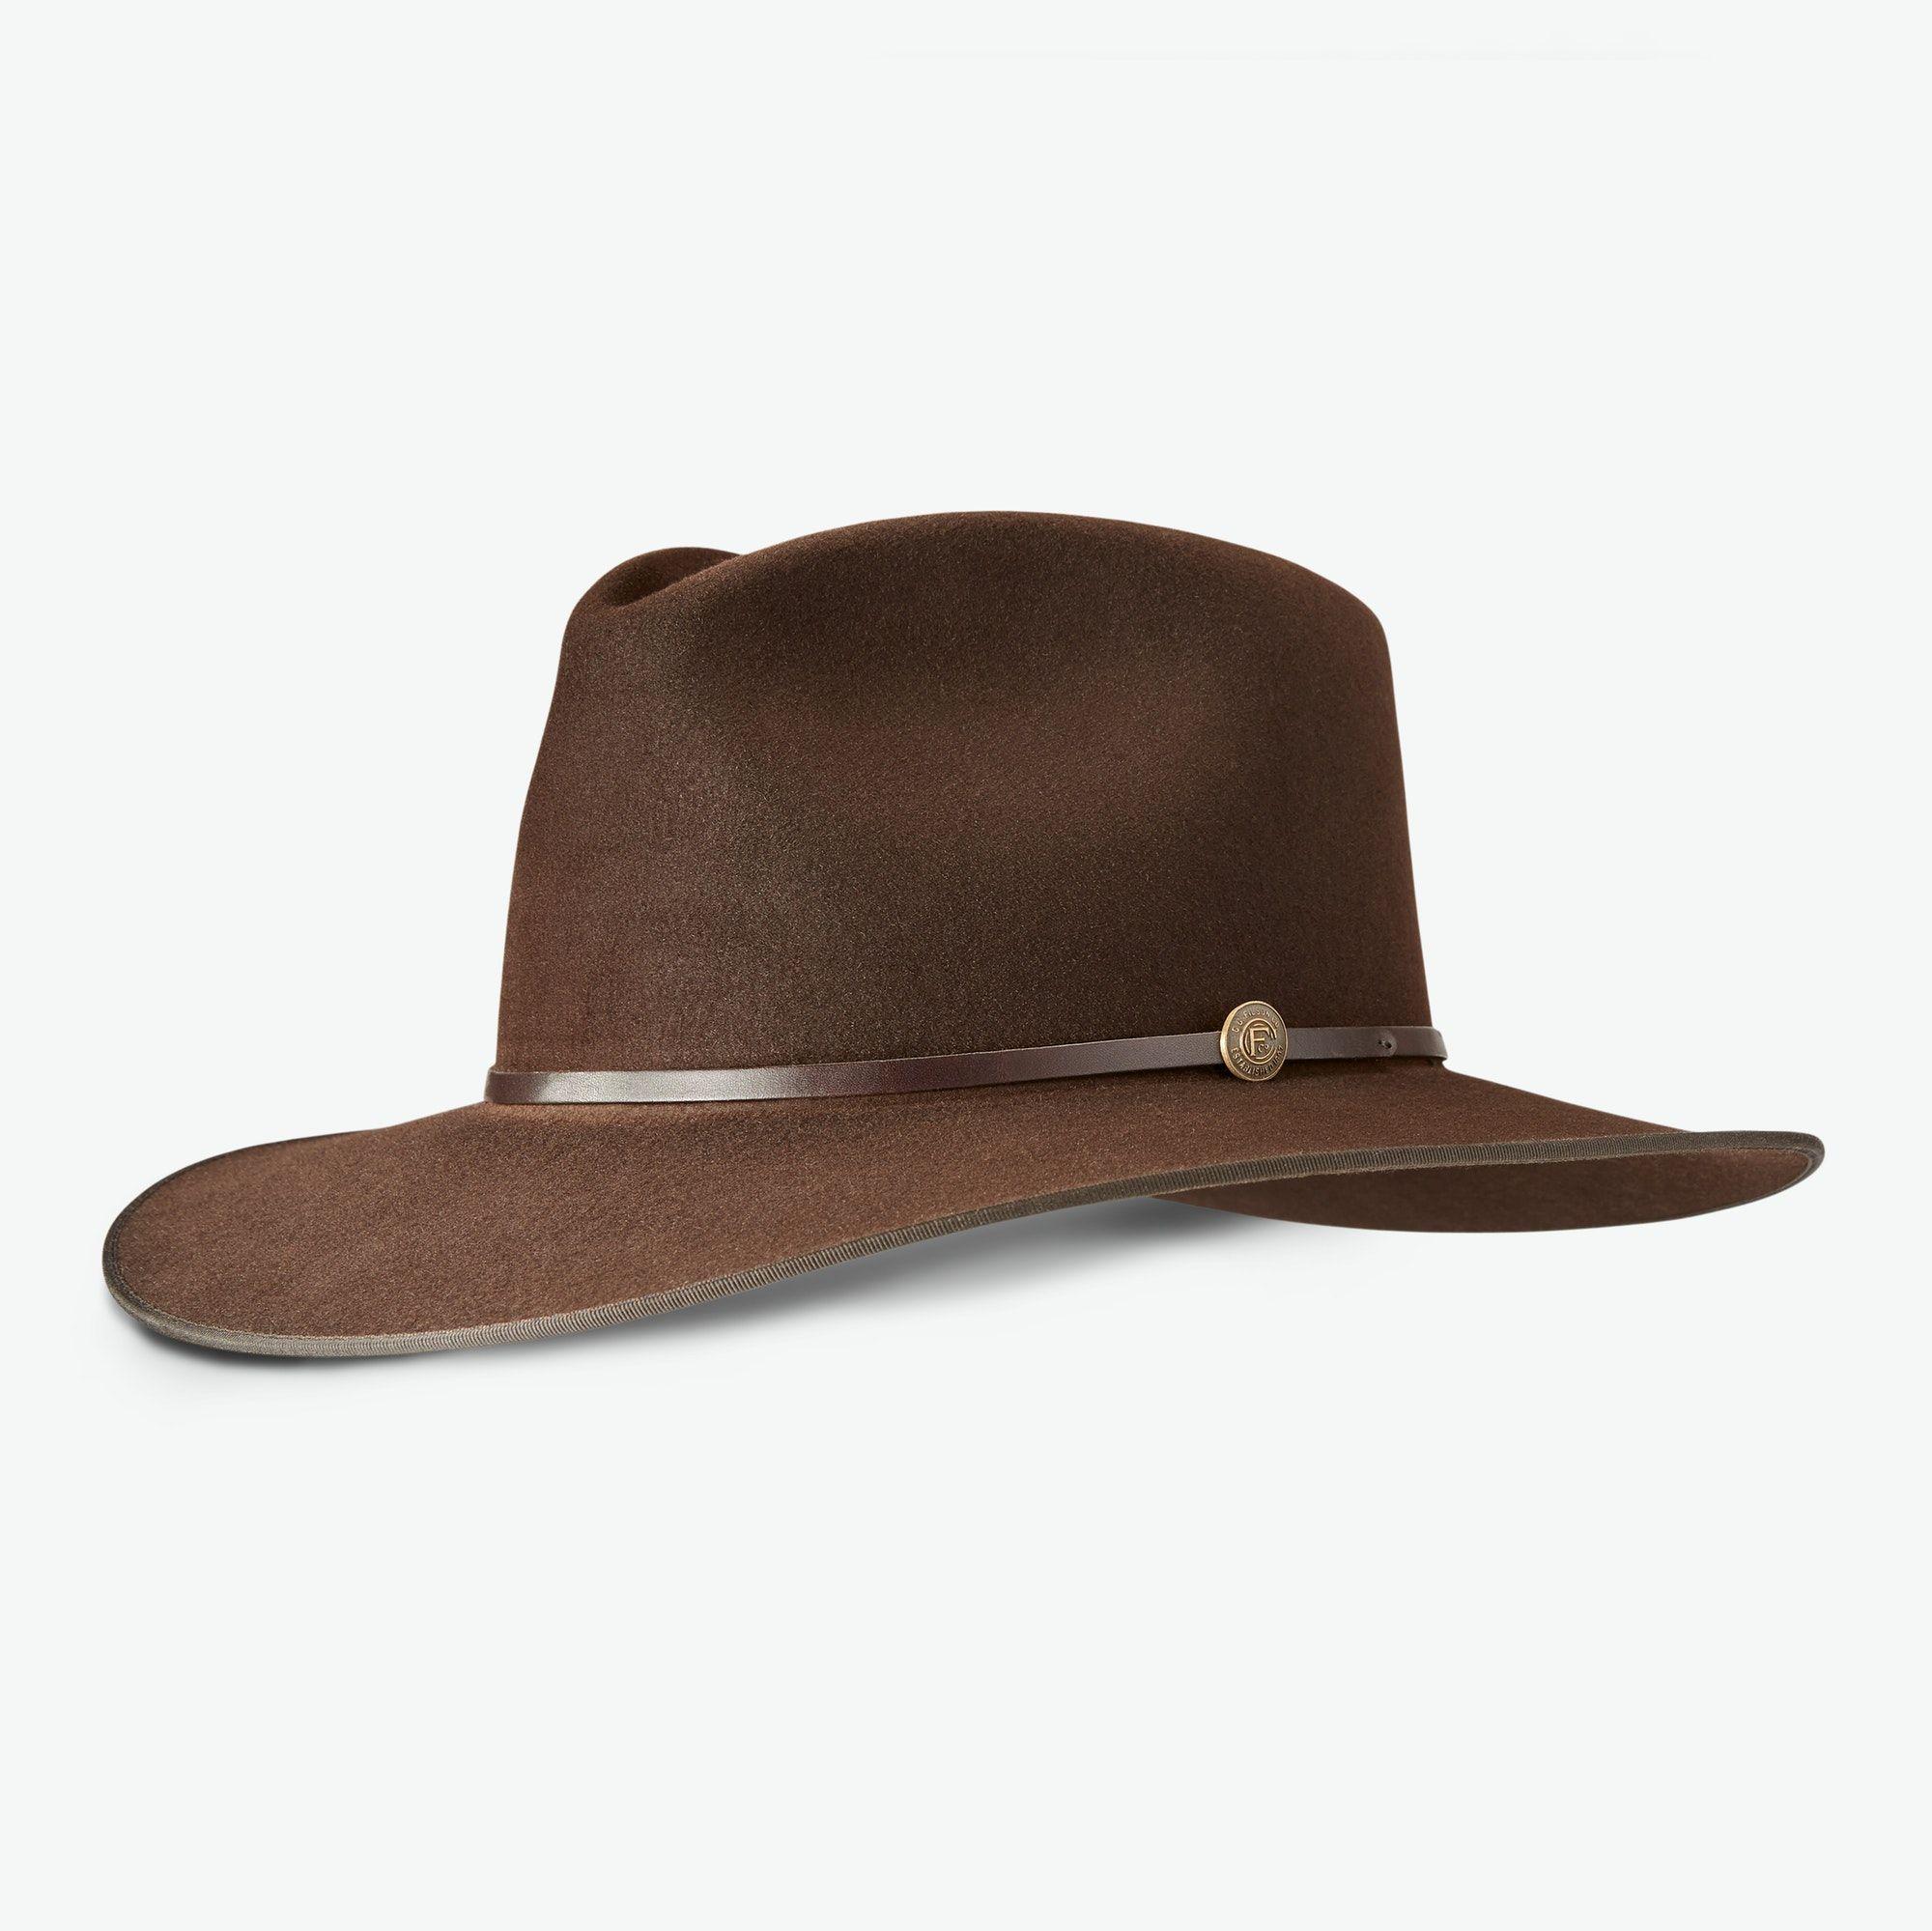 Filson X Stetson Wolf Canyon Hat In 2021 Stetson Cowboy Hats Women Hats Fashion Best Winter Hats